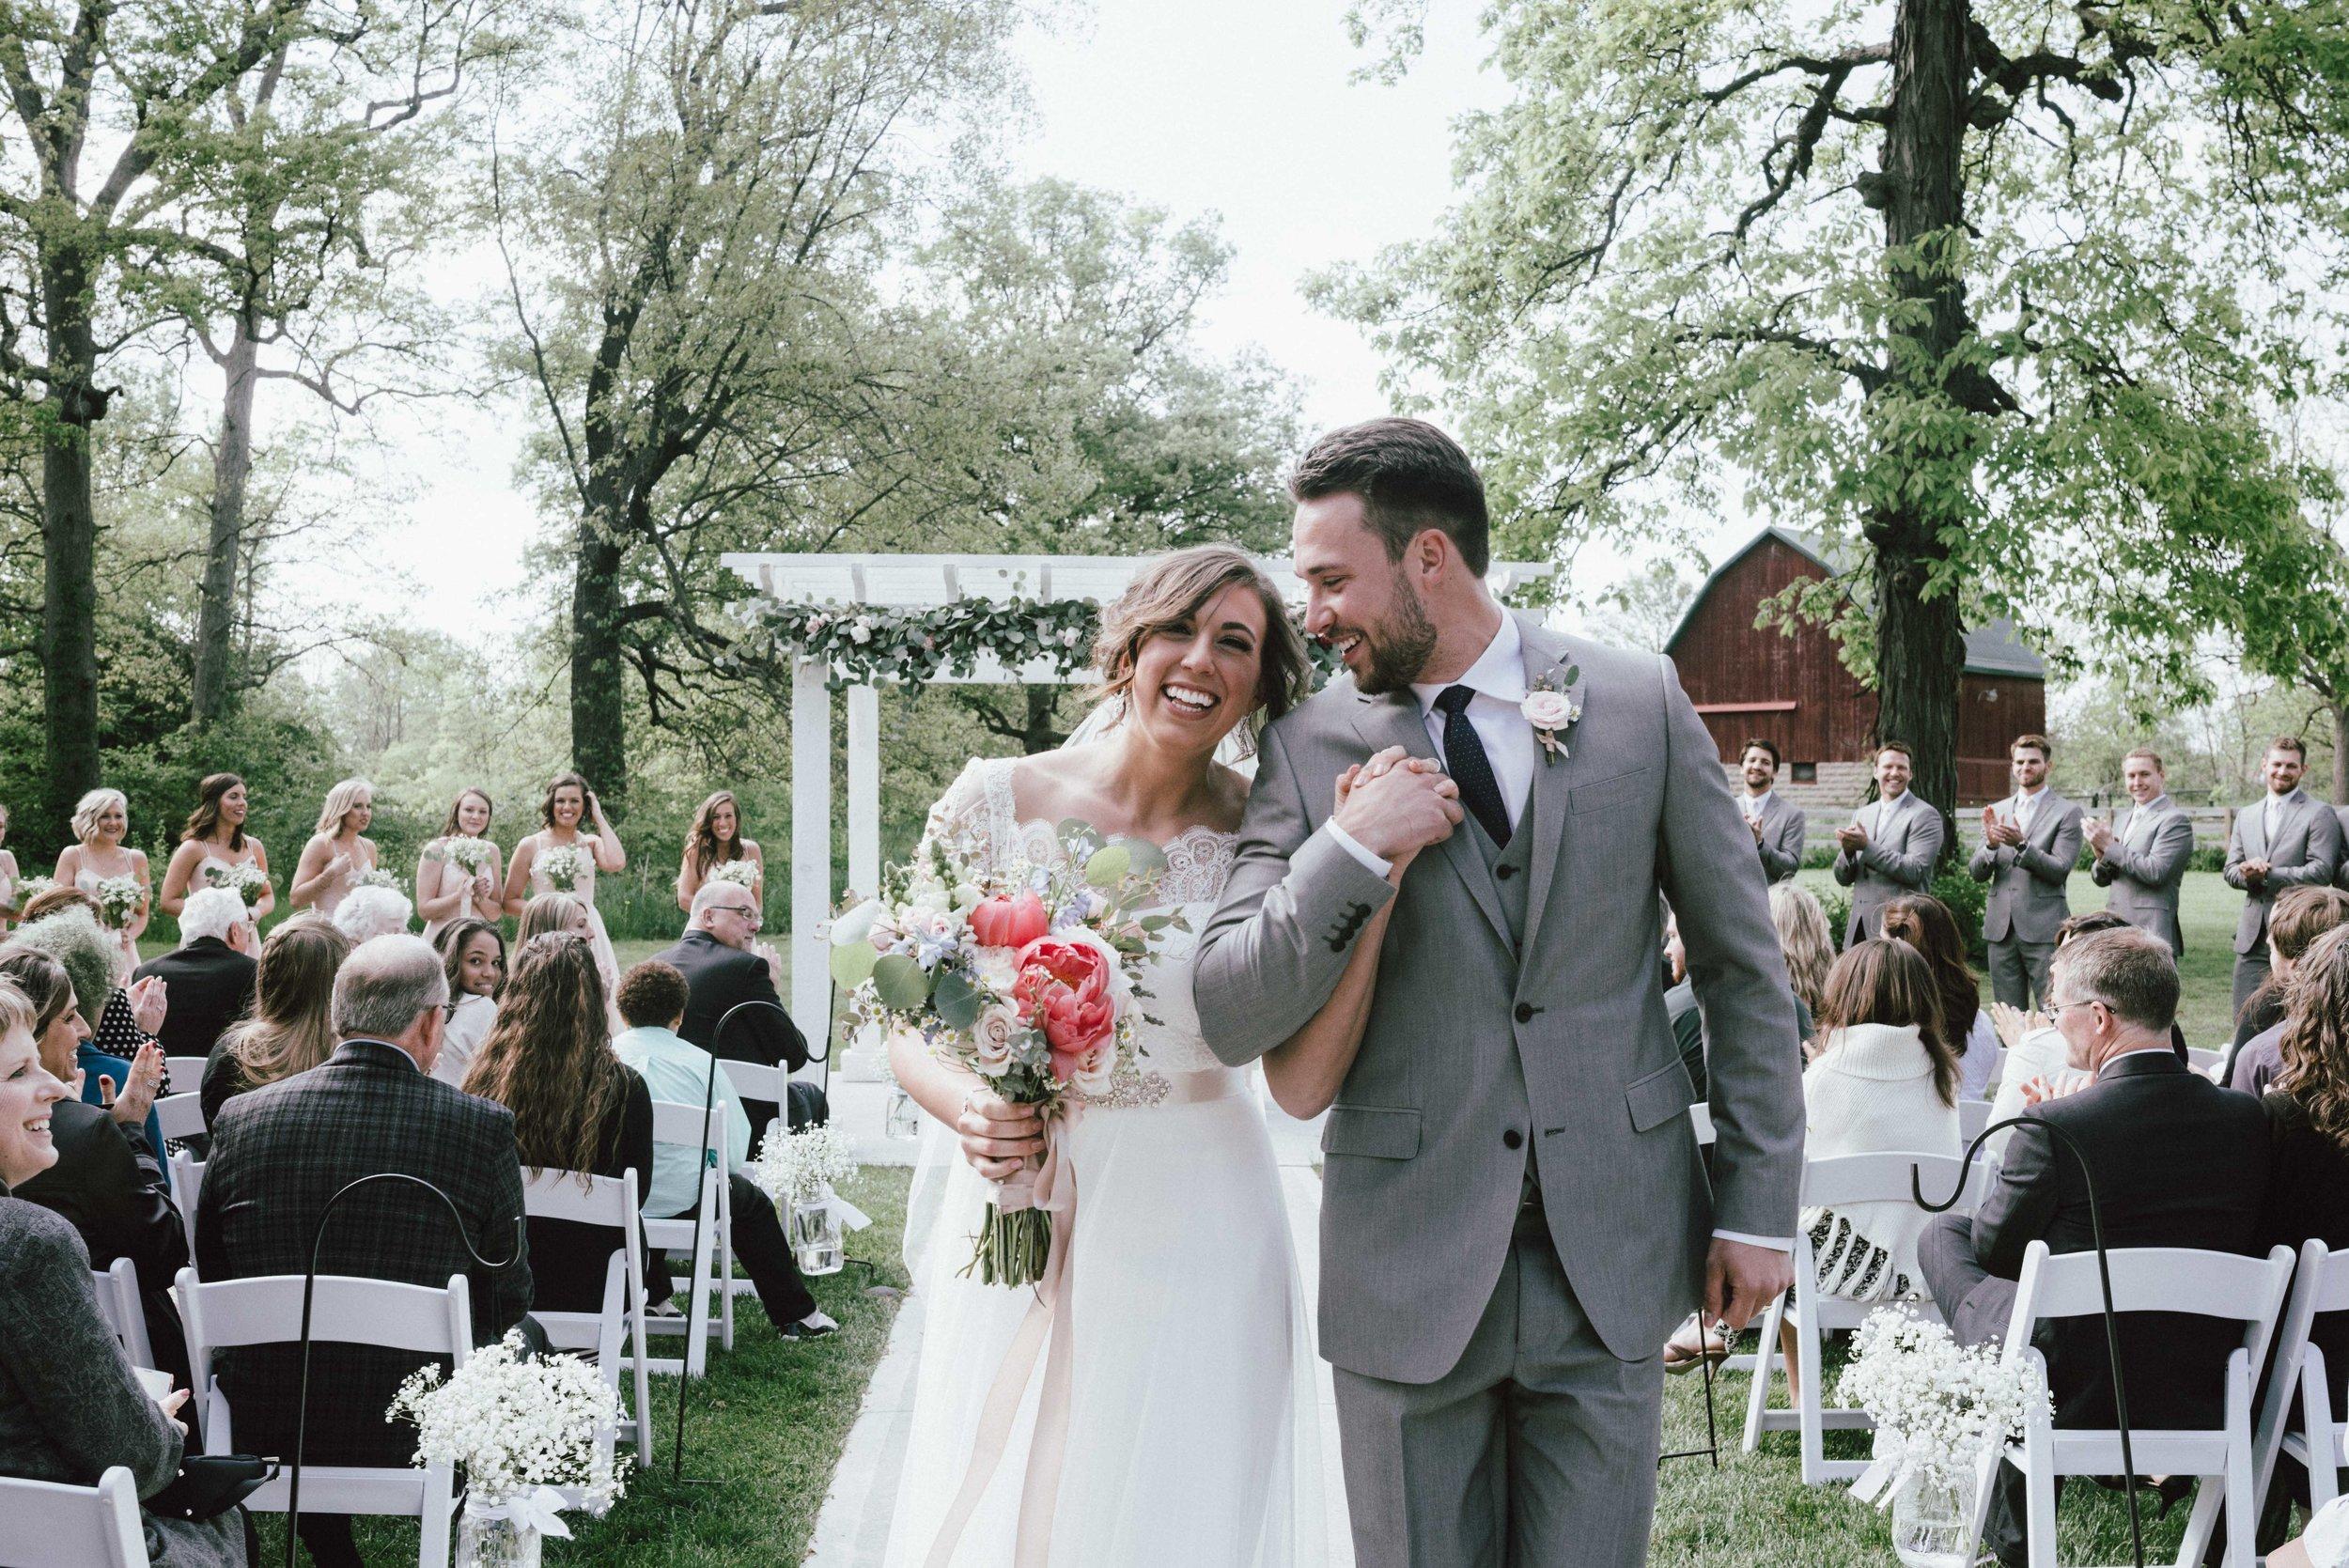 Steph-Ben-Blog-Indianapolis-Wedding-39.jpg